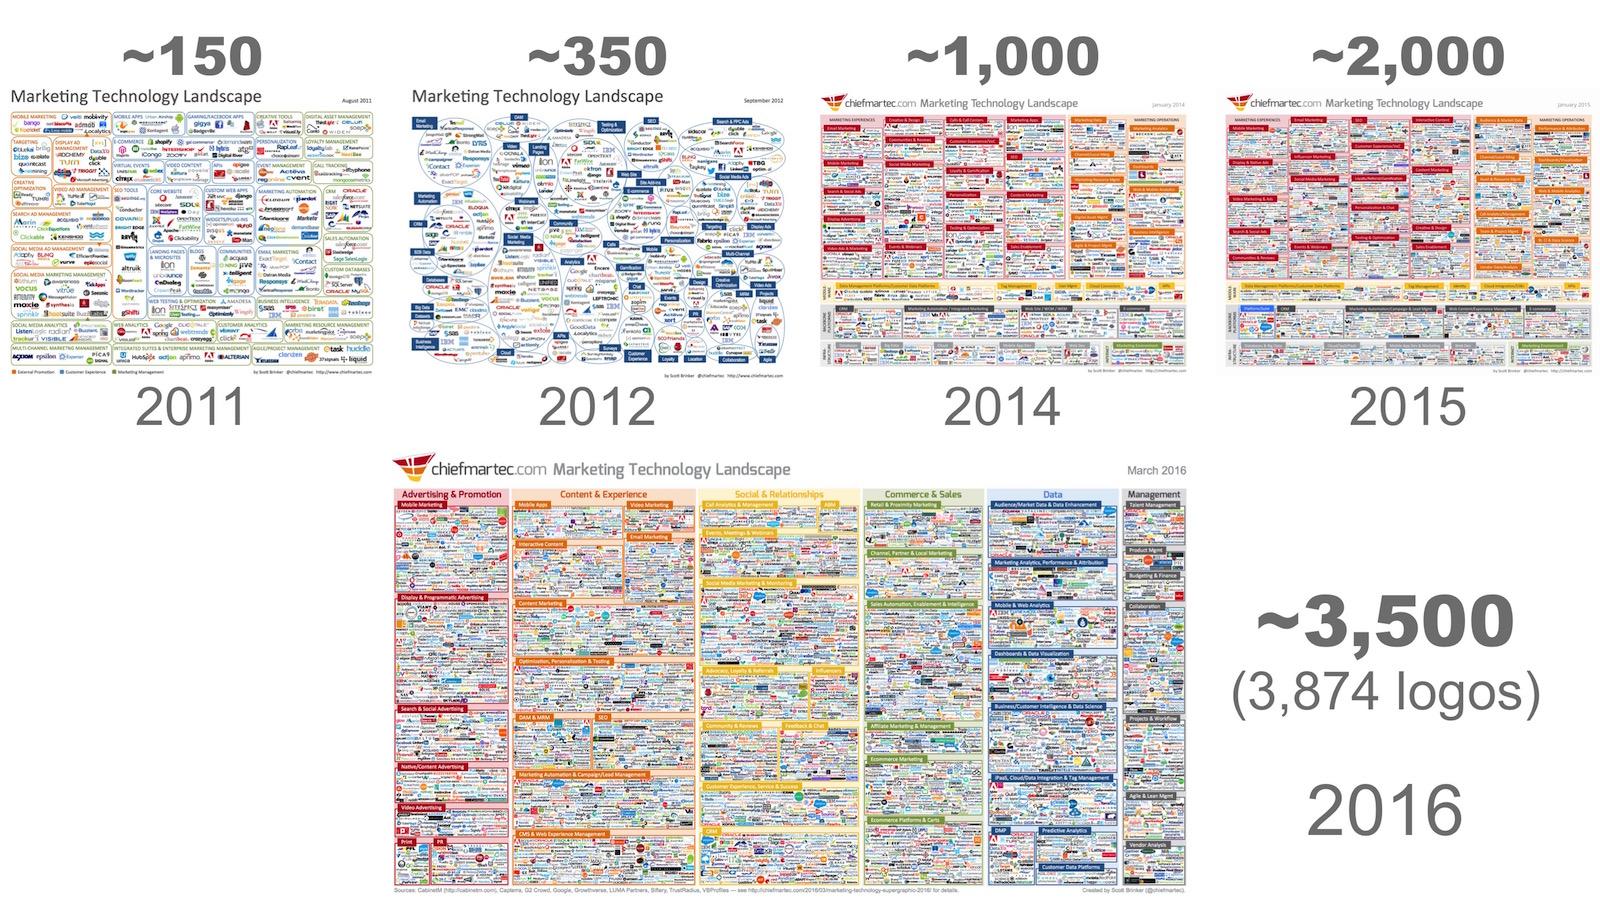 marketing technology landscape timeline 2011 through 2016